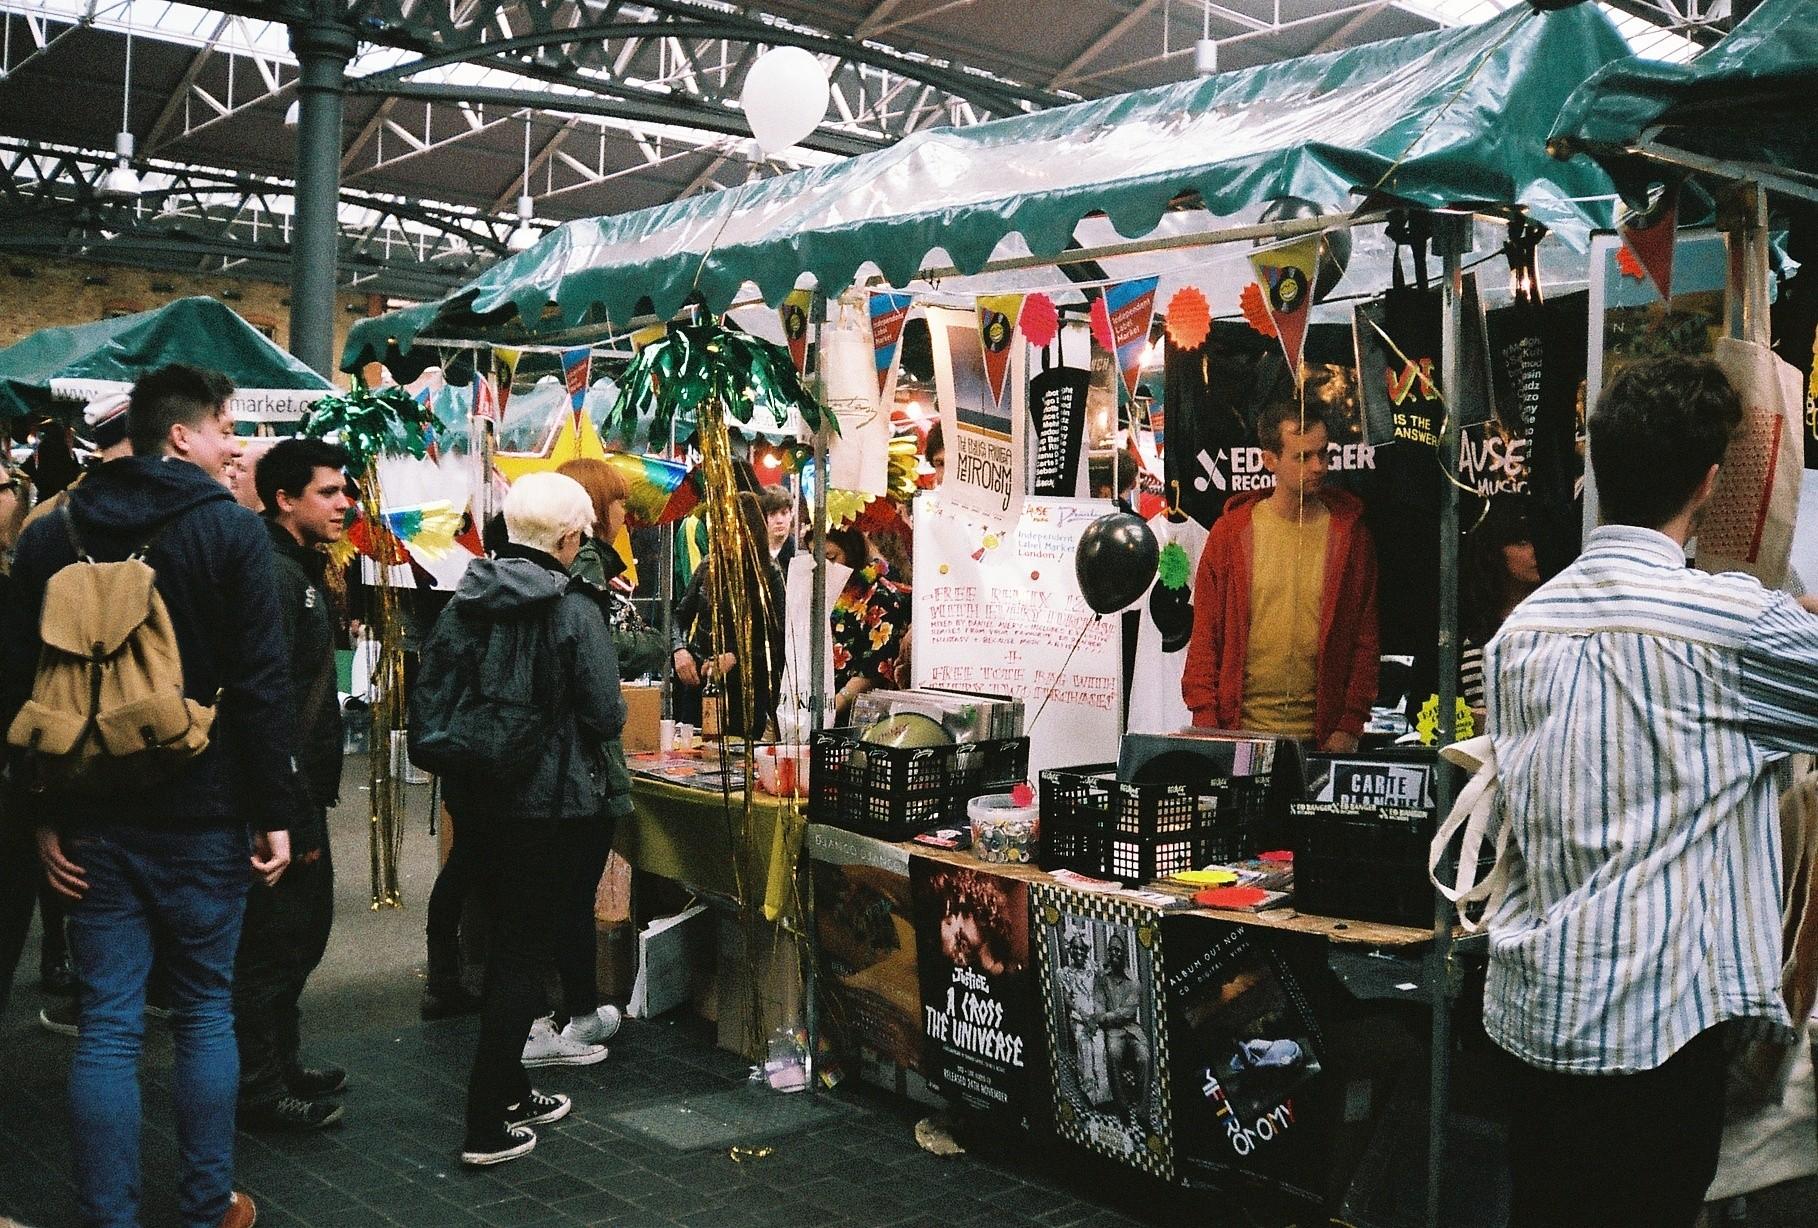 Old Spitalfield's market